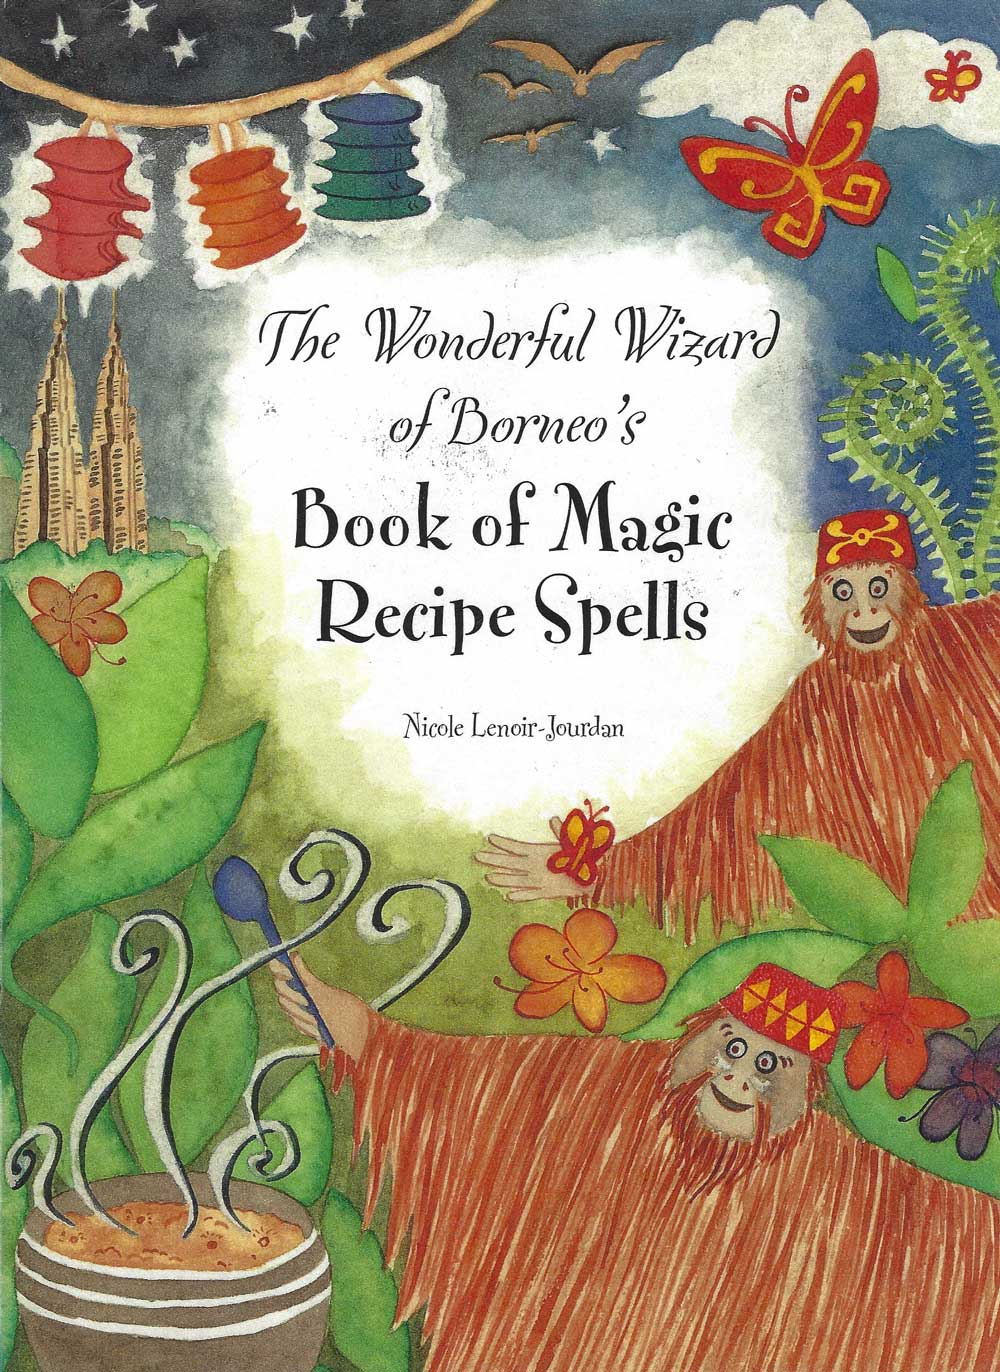 The-wonderful-wizard-of-borneo's-book-of-magic-recipe-spells.jpg